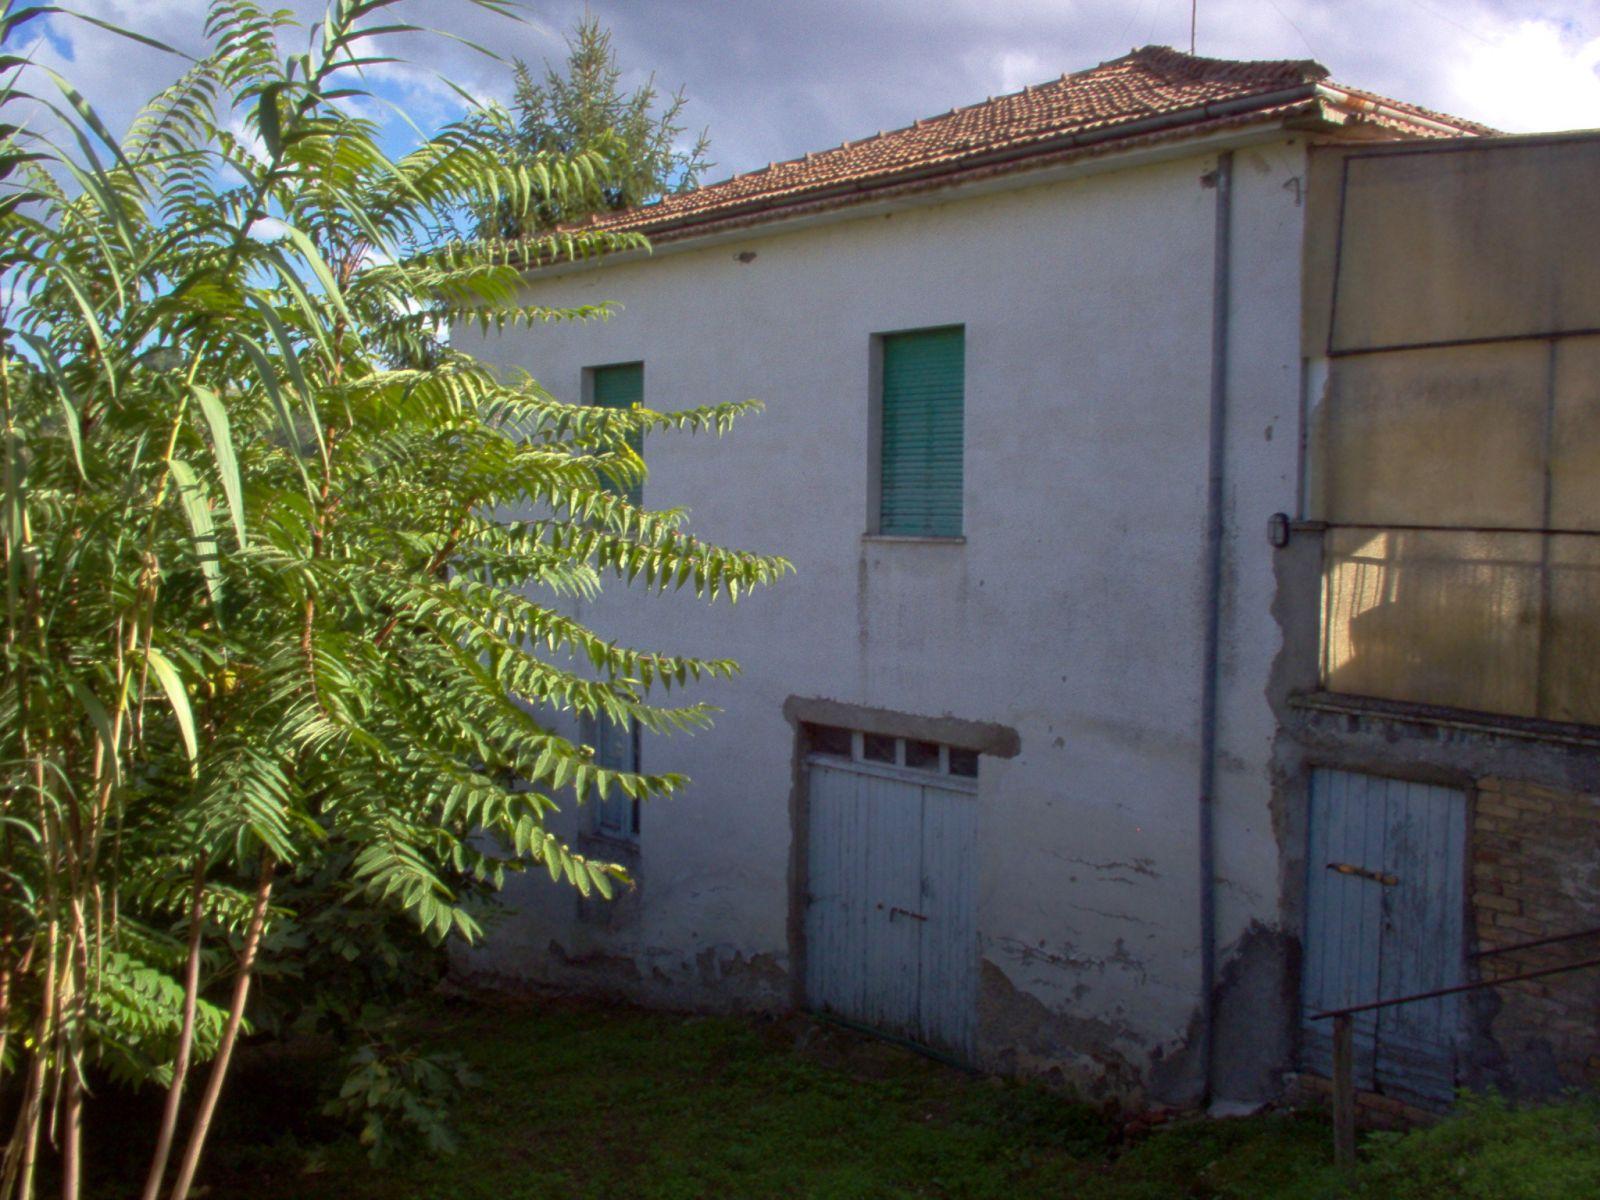 Casa indipendente in vendita a ari ch contrada santa maria annunci immobiliari - Case in vendita ...